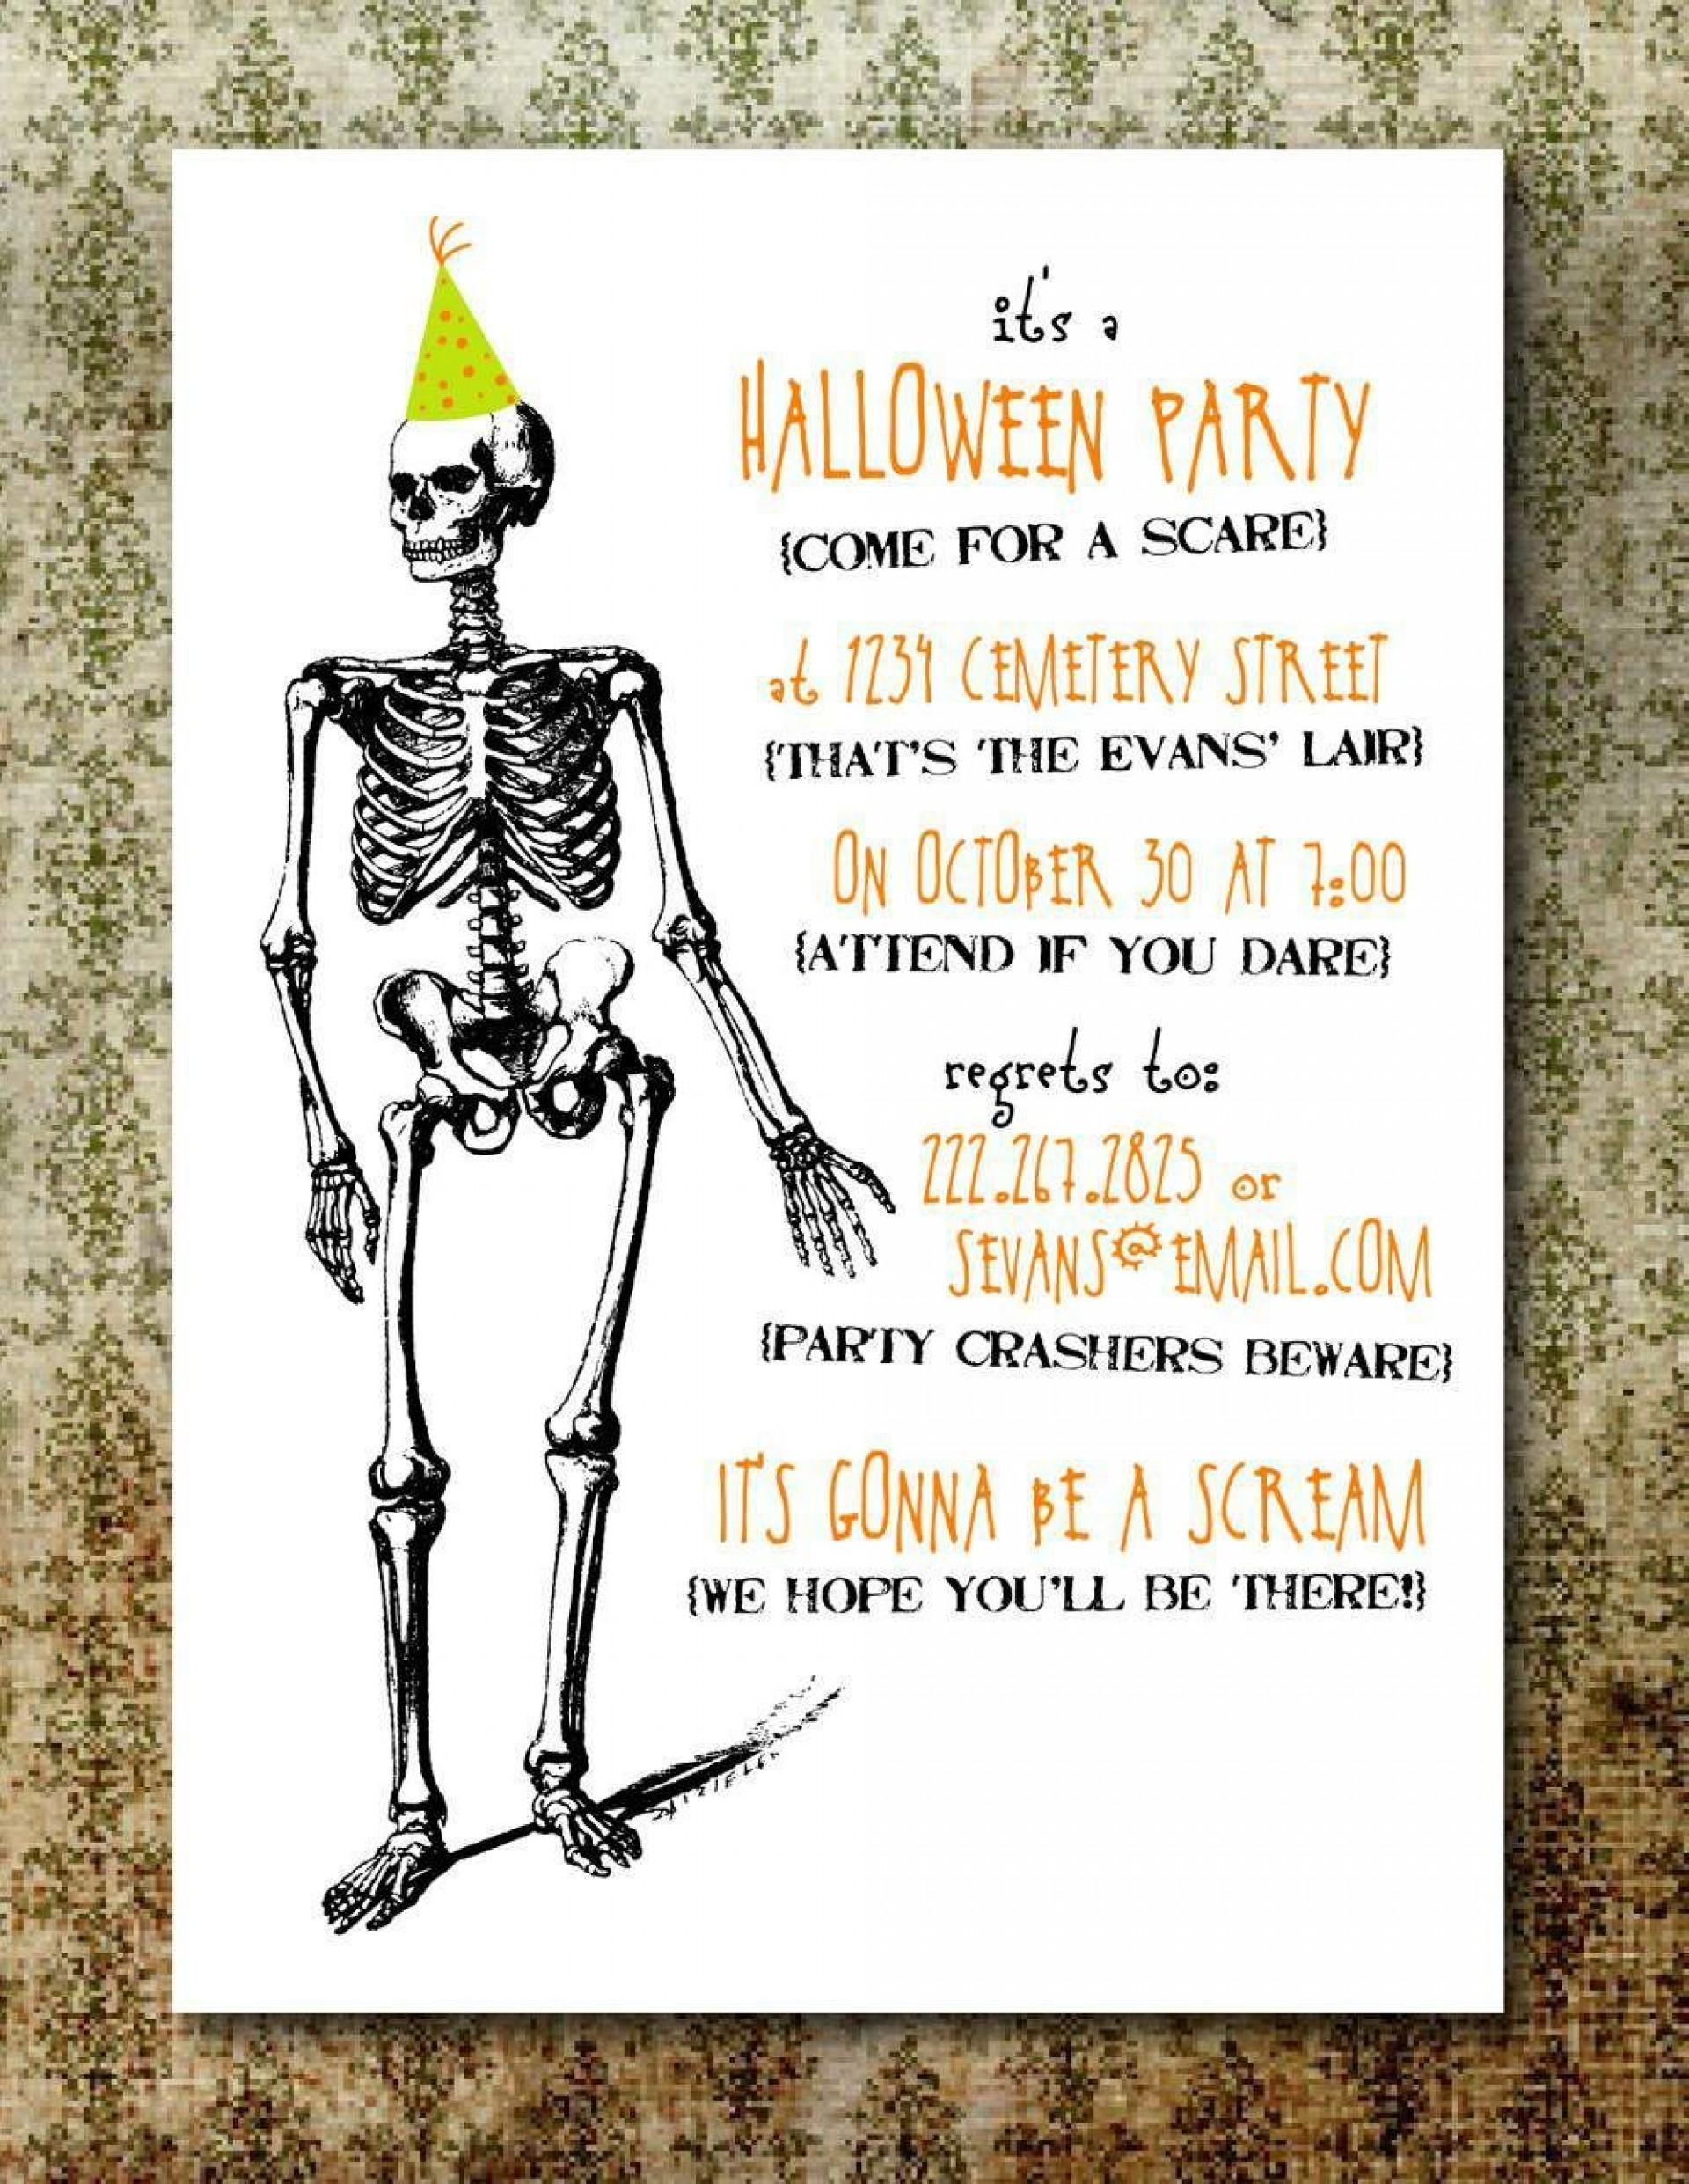 005 Rare Free Halloween Invitation Template Highest Clarity  Templates Microsoft Word Wedding Printable Party1920